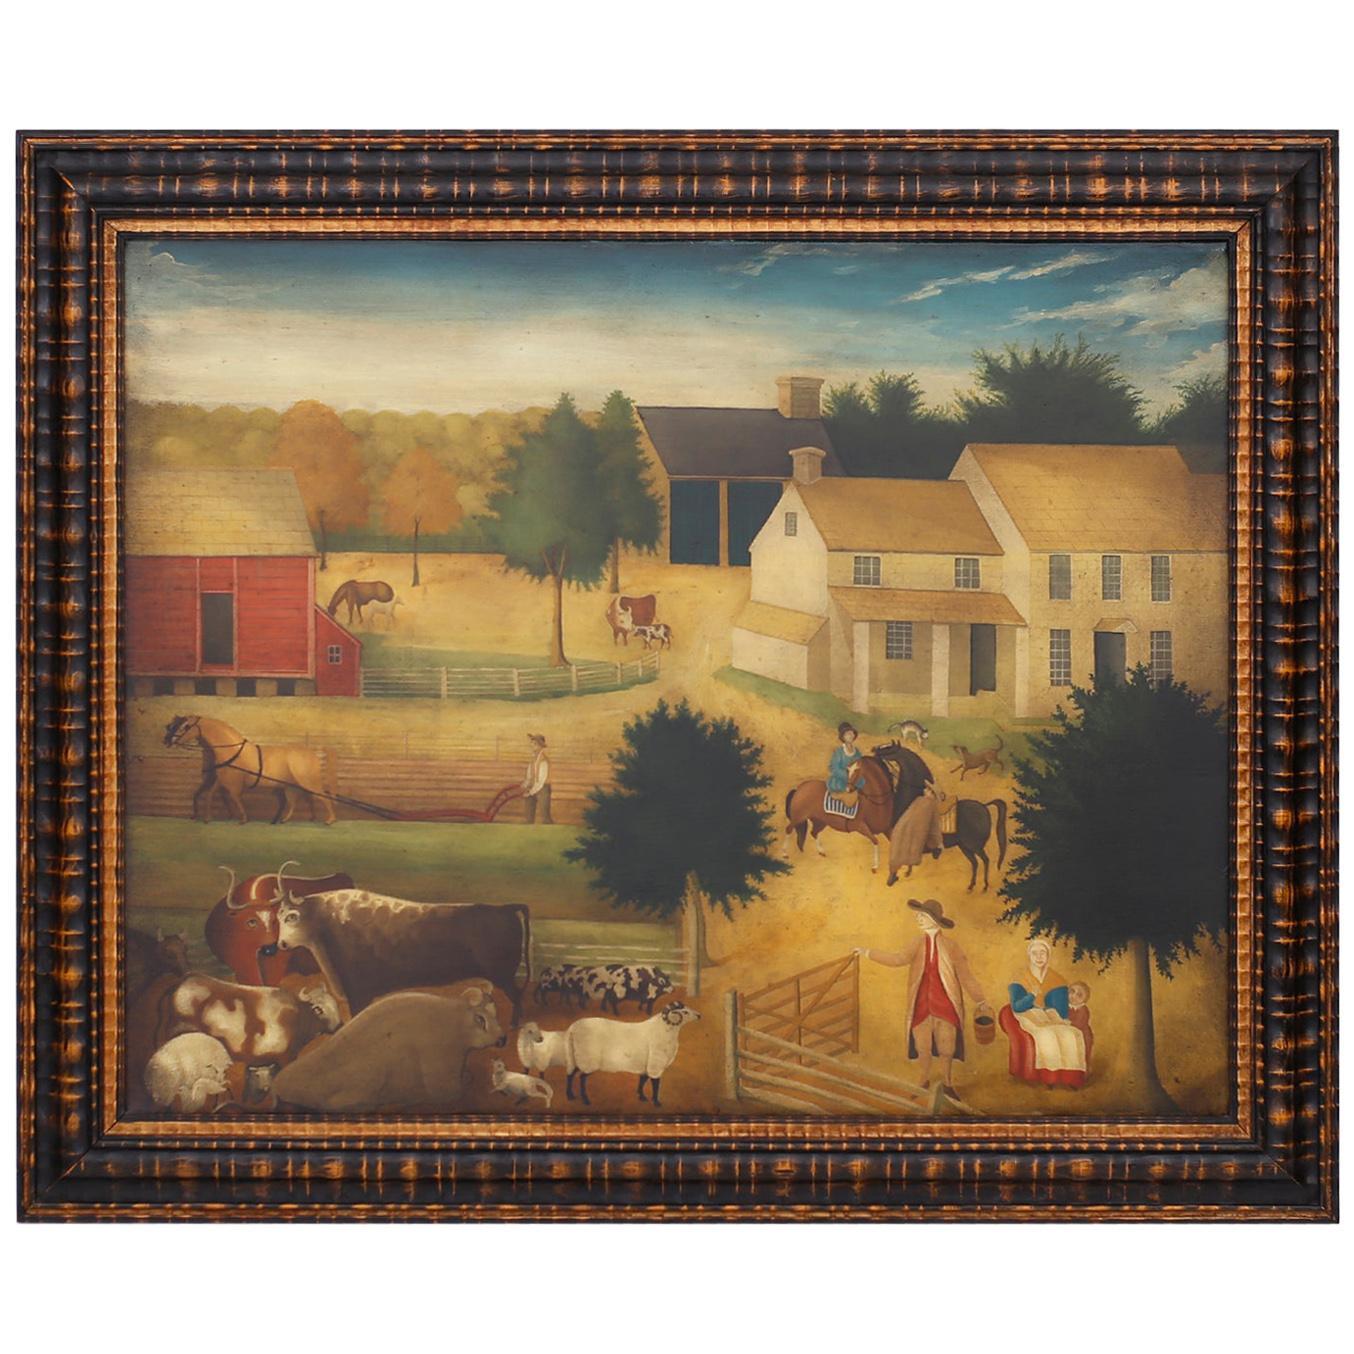 Oil Painting on Canvas of a Farm Scene